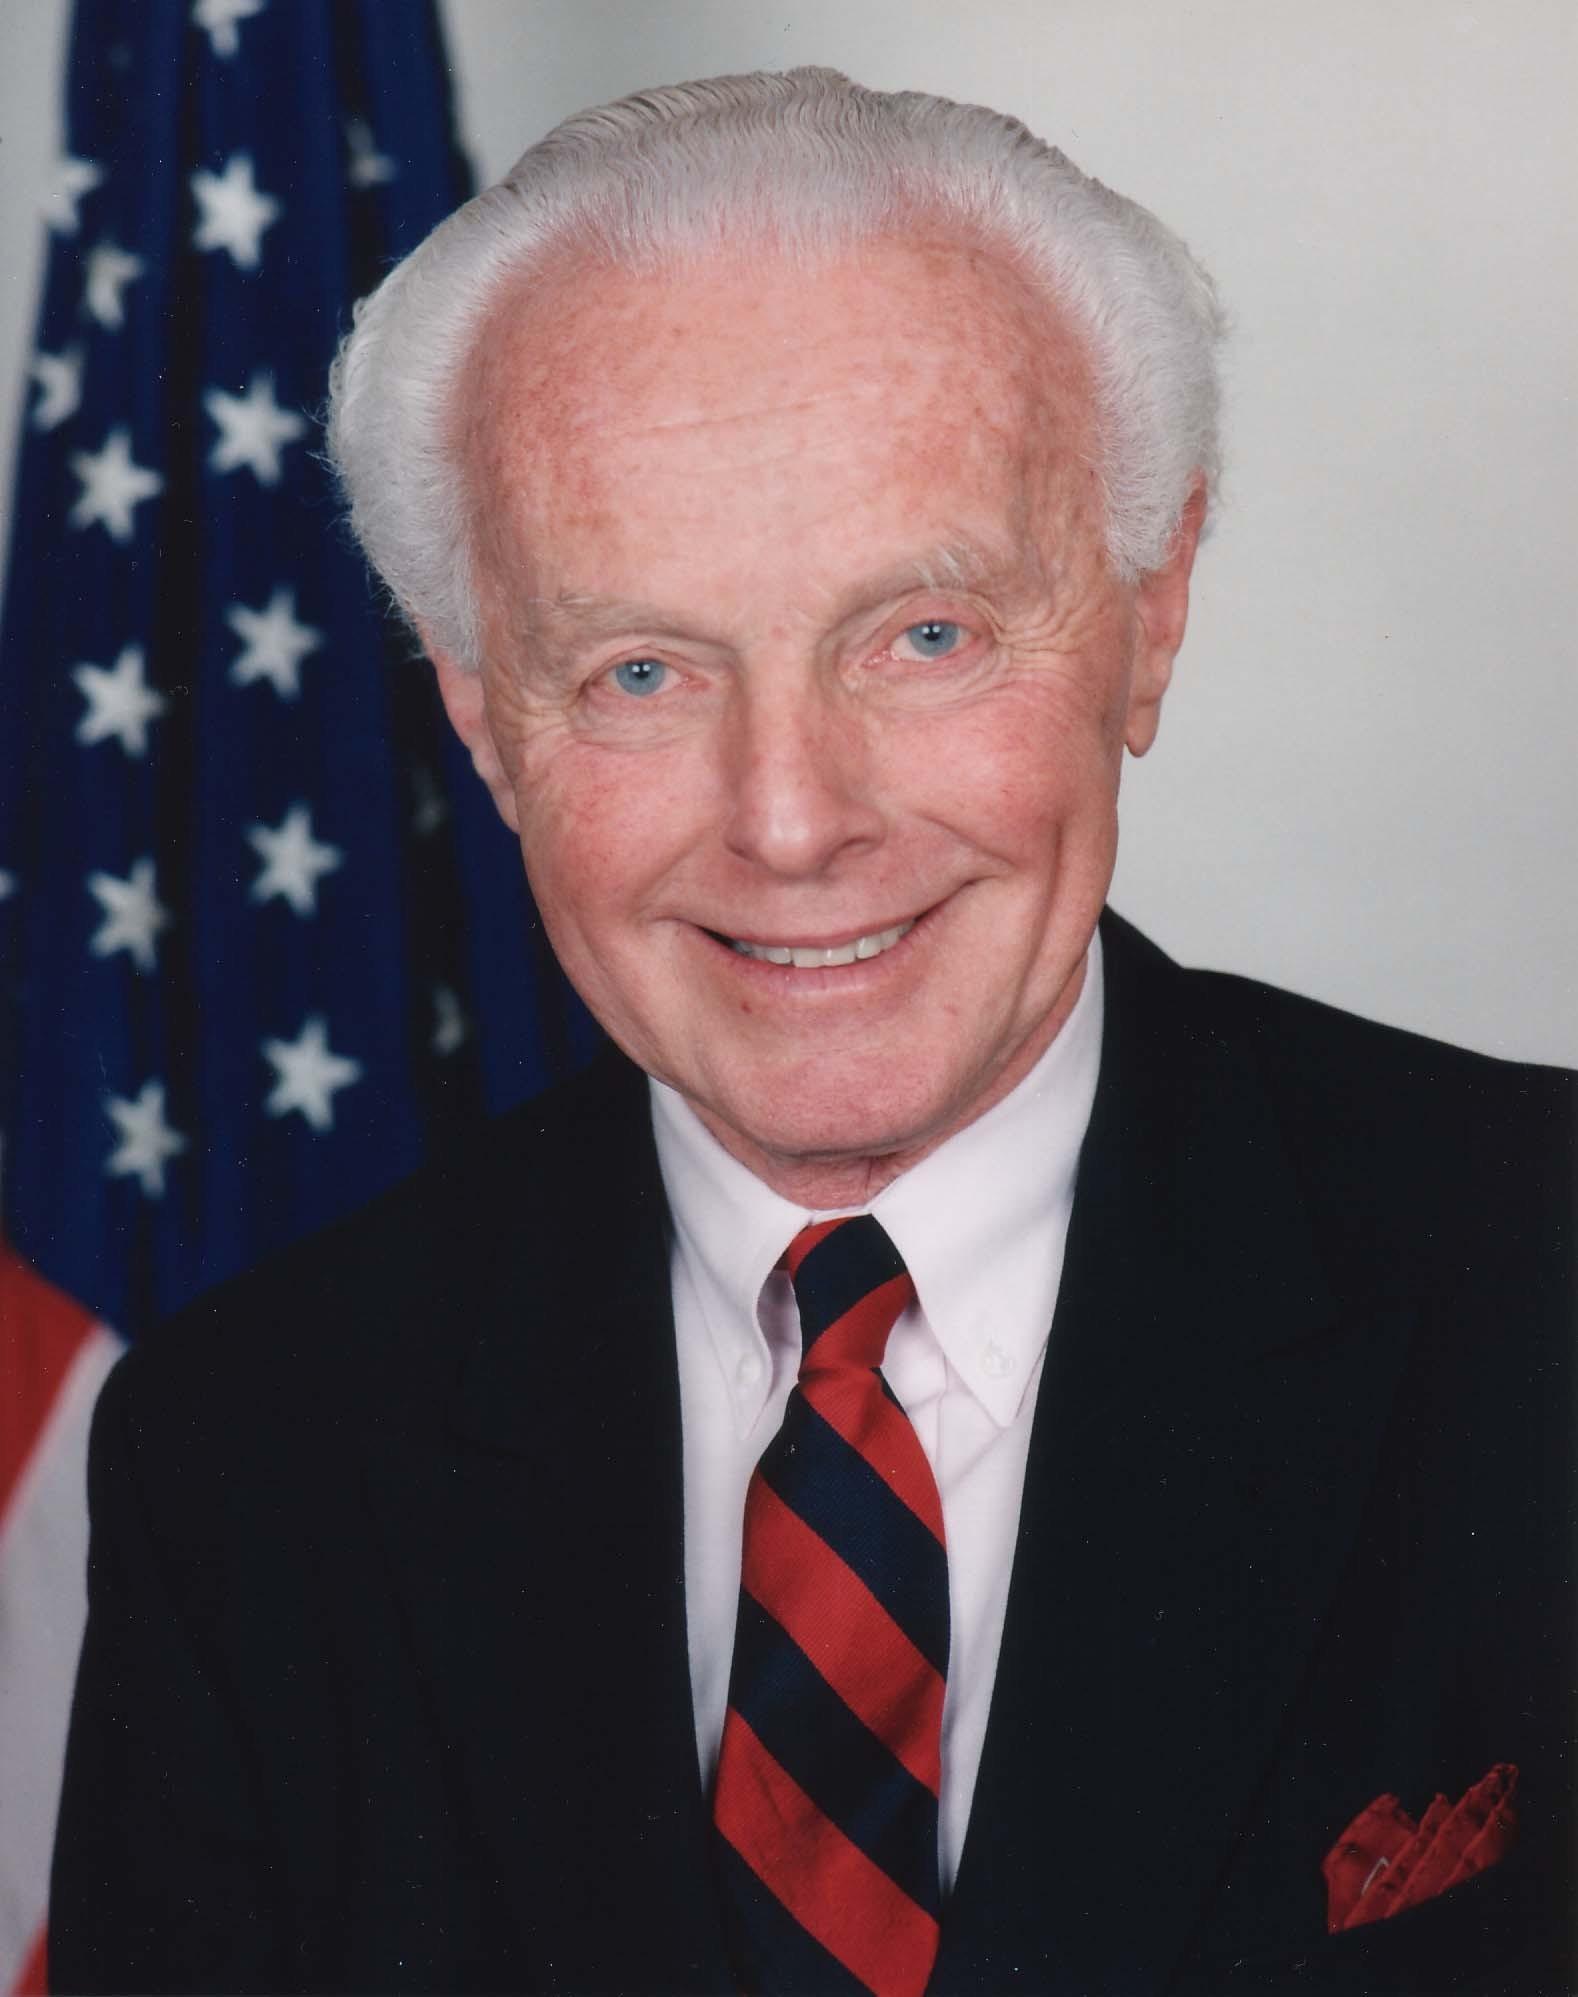 https://i2.wp.com/upload.wikimedia.org/wikipedia/commons/6/69/Tom_Lantos.jpg